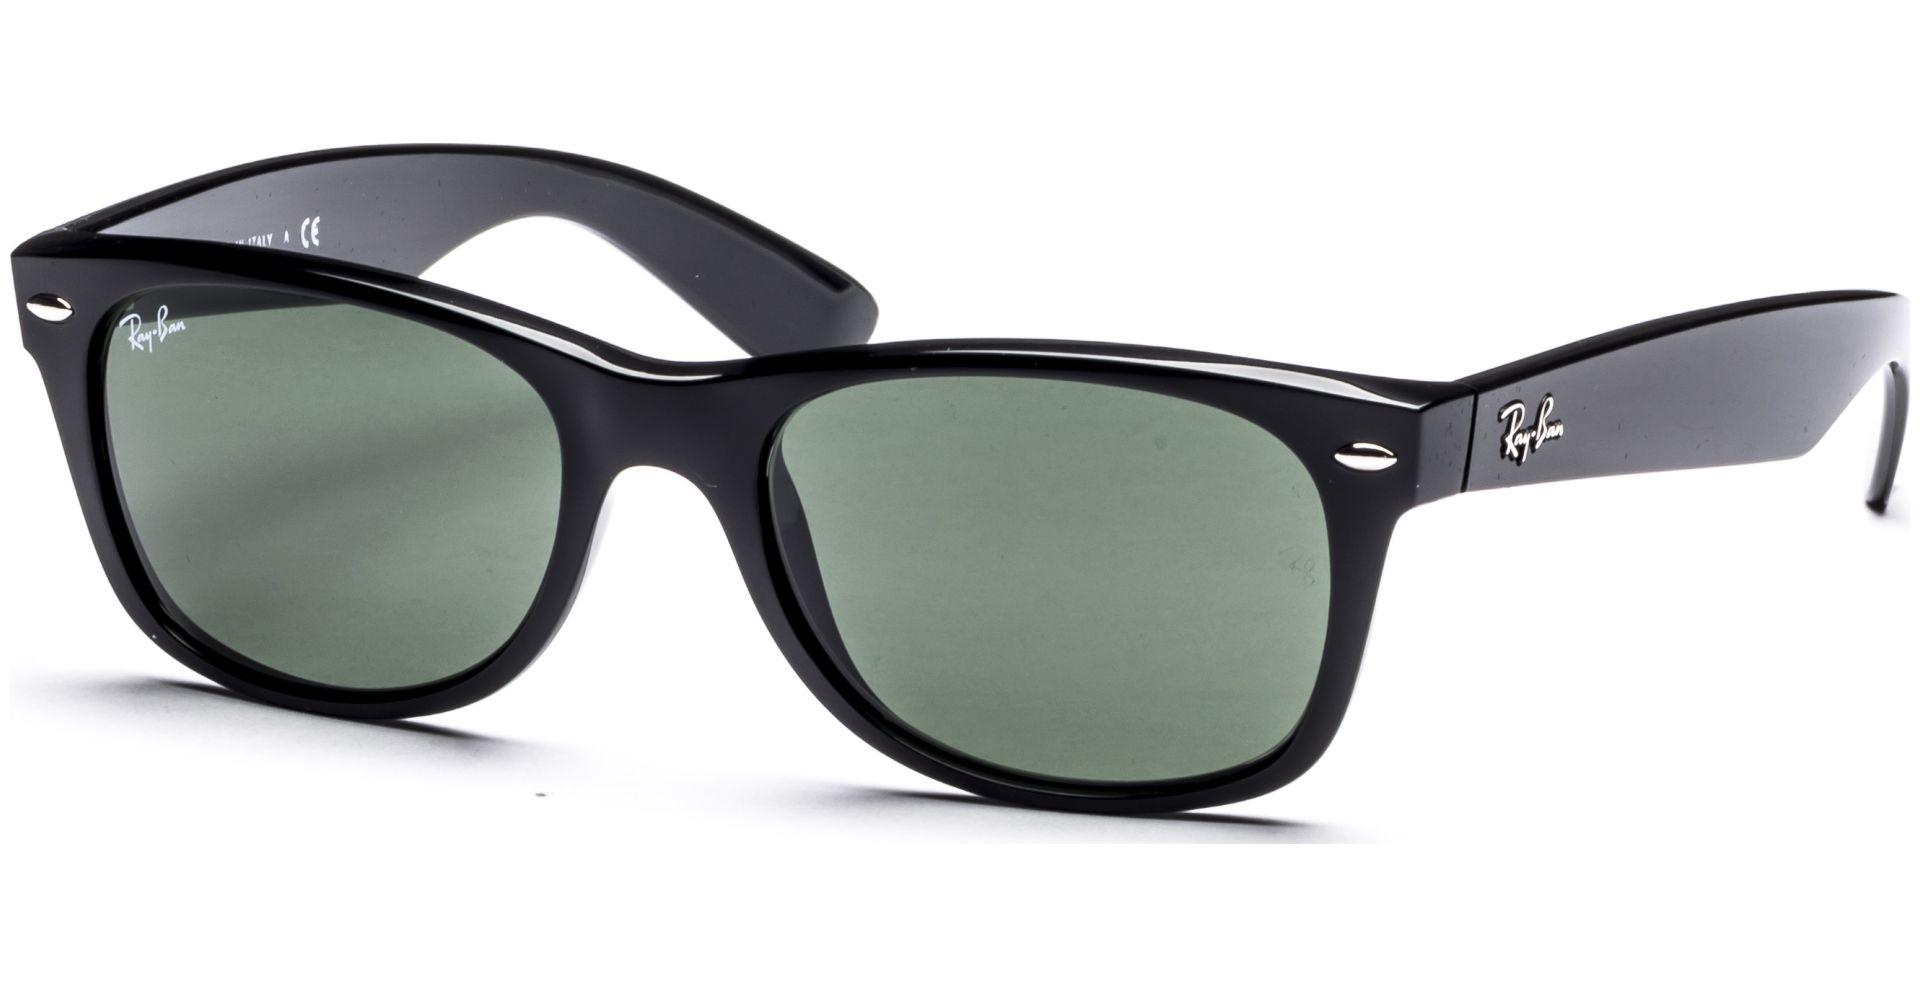 Ray-Ban - New Wayfarer 2132 901 5218 Black/Crystal Green - von Lensbest